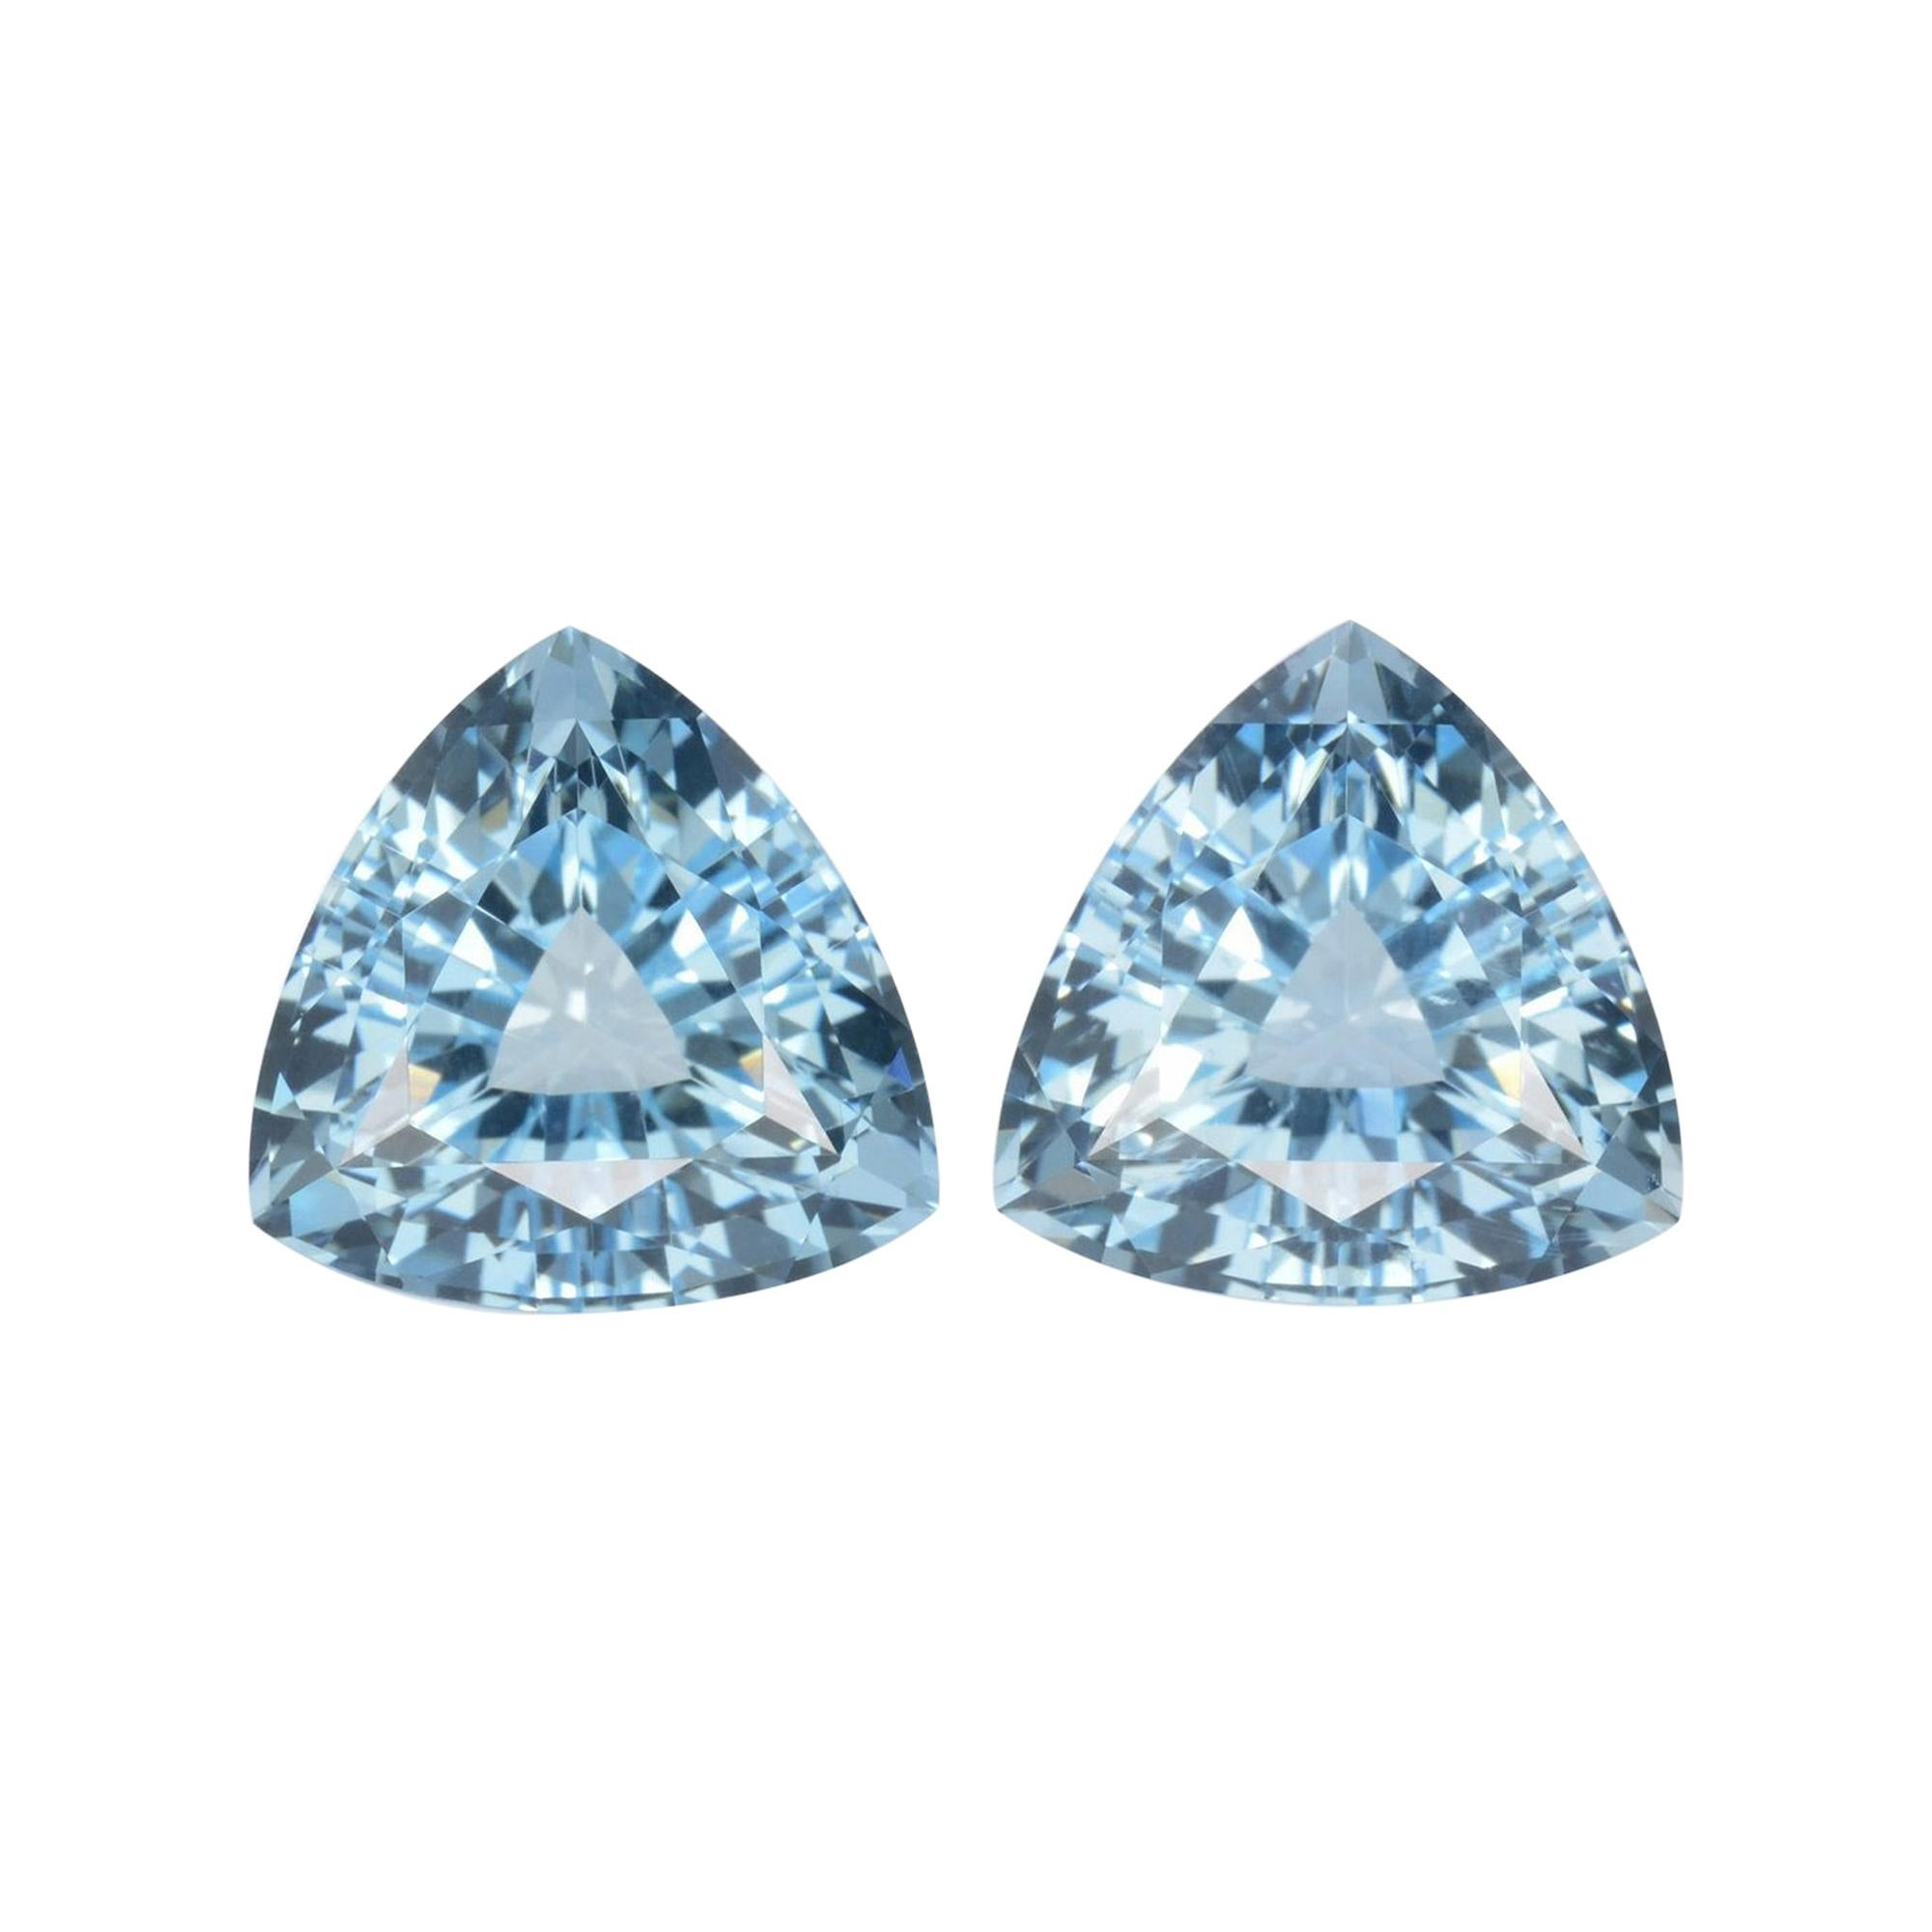 Aquamarine Earrings Gemstone Pair 8.59 Carat Trillion Loose Gems